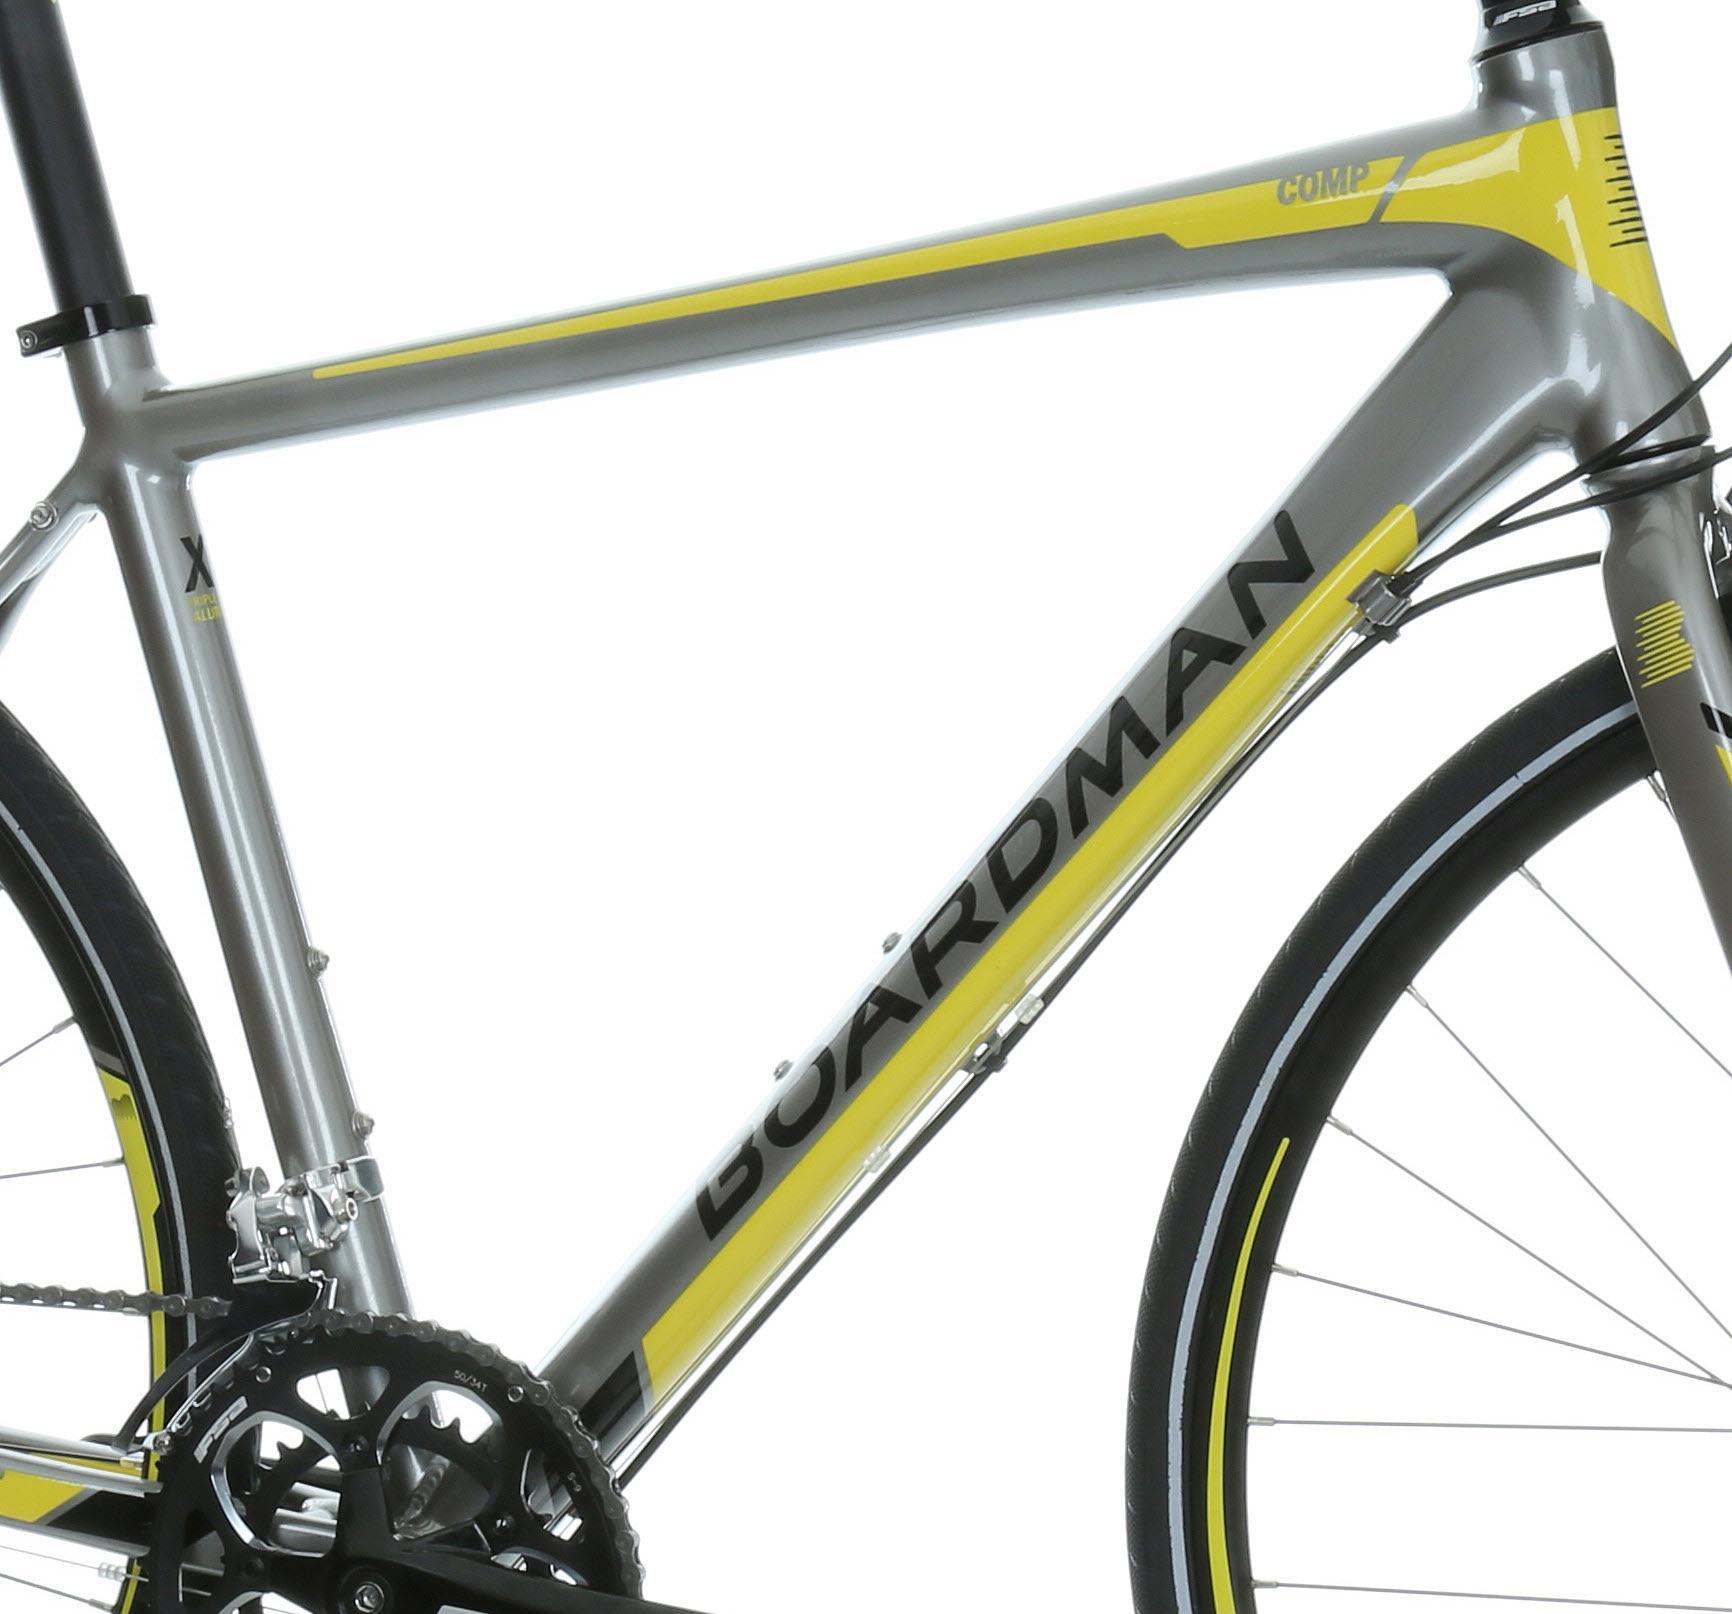 Details about Boardman 2016 Hybrid Comp Mens Bike Bicycle Alloy Frame 18  Speed 700C Wheel